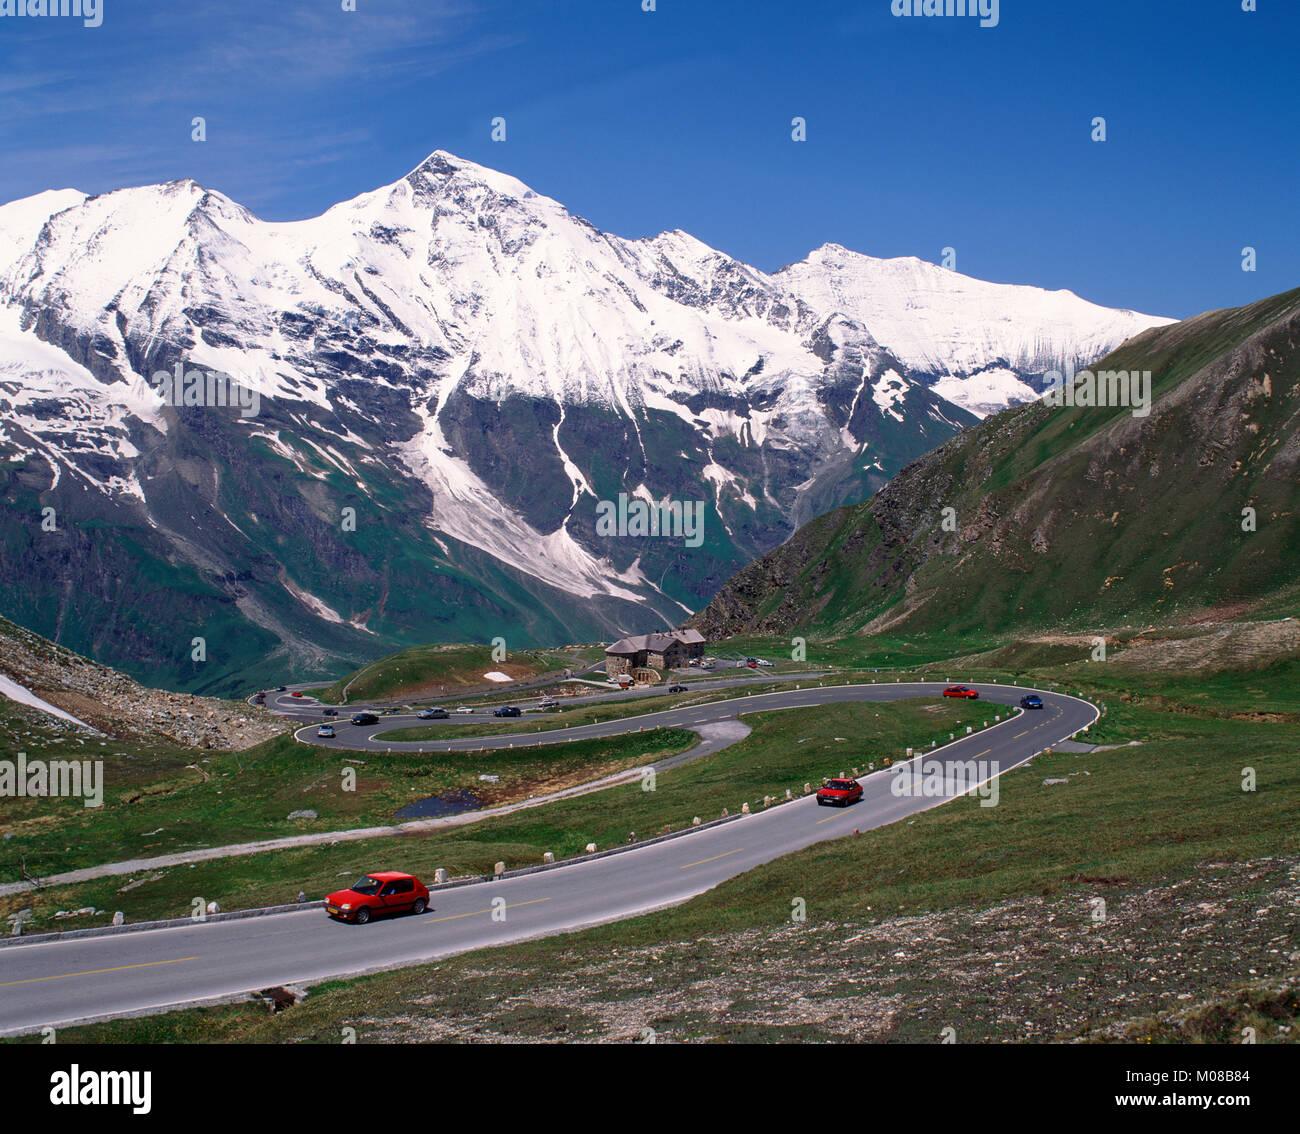 Grossglockner Pass, Hohe Tauern National Park, Carinthia, Austria Stock Photo